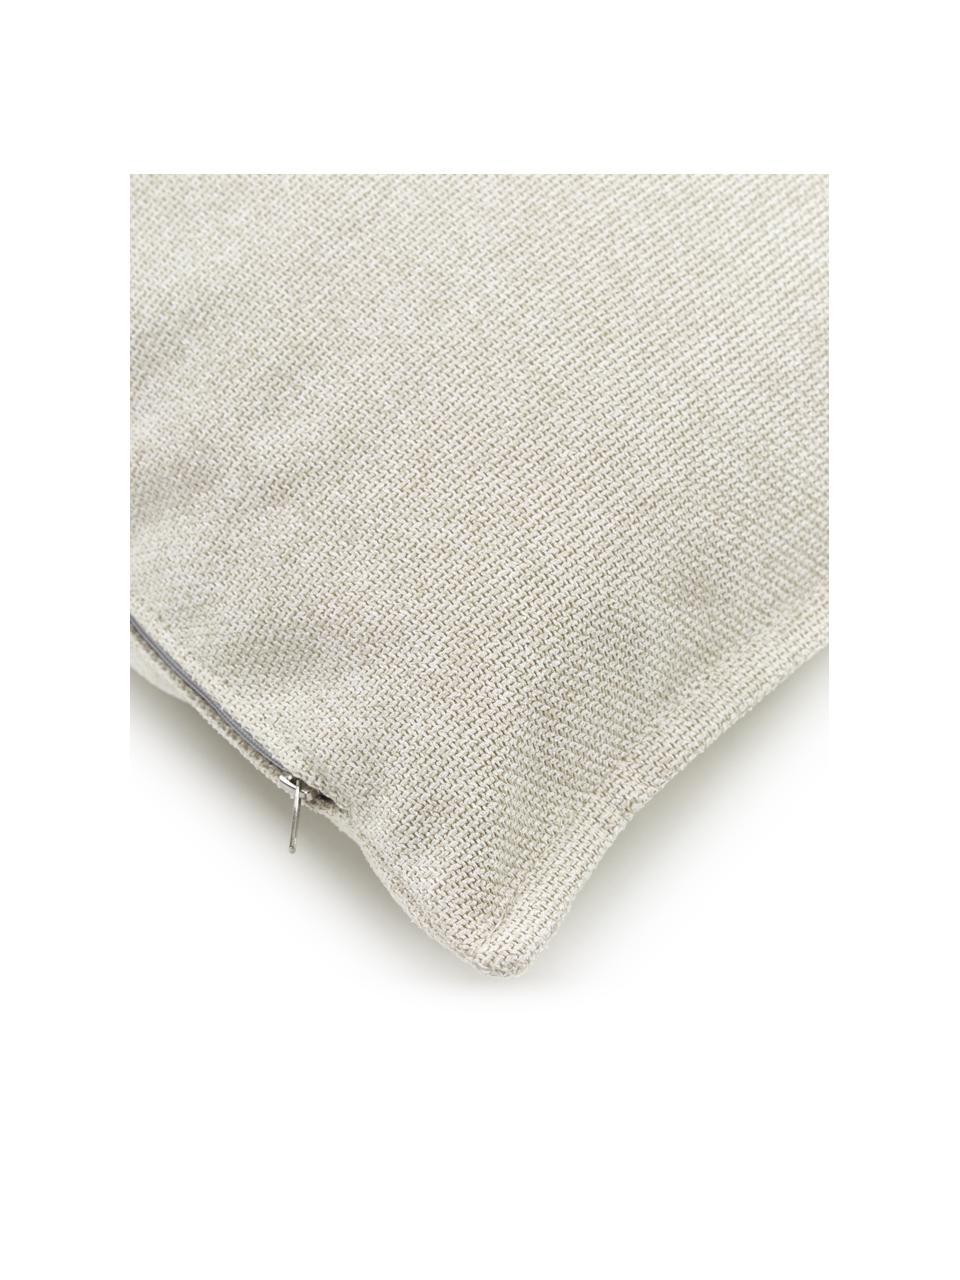 Sofa-Kissen Lennon in Beige, Bezug: 100% Polyester, Beige, 60 x 60 cm